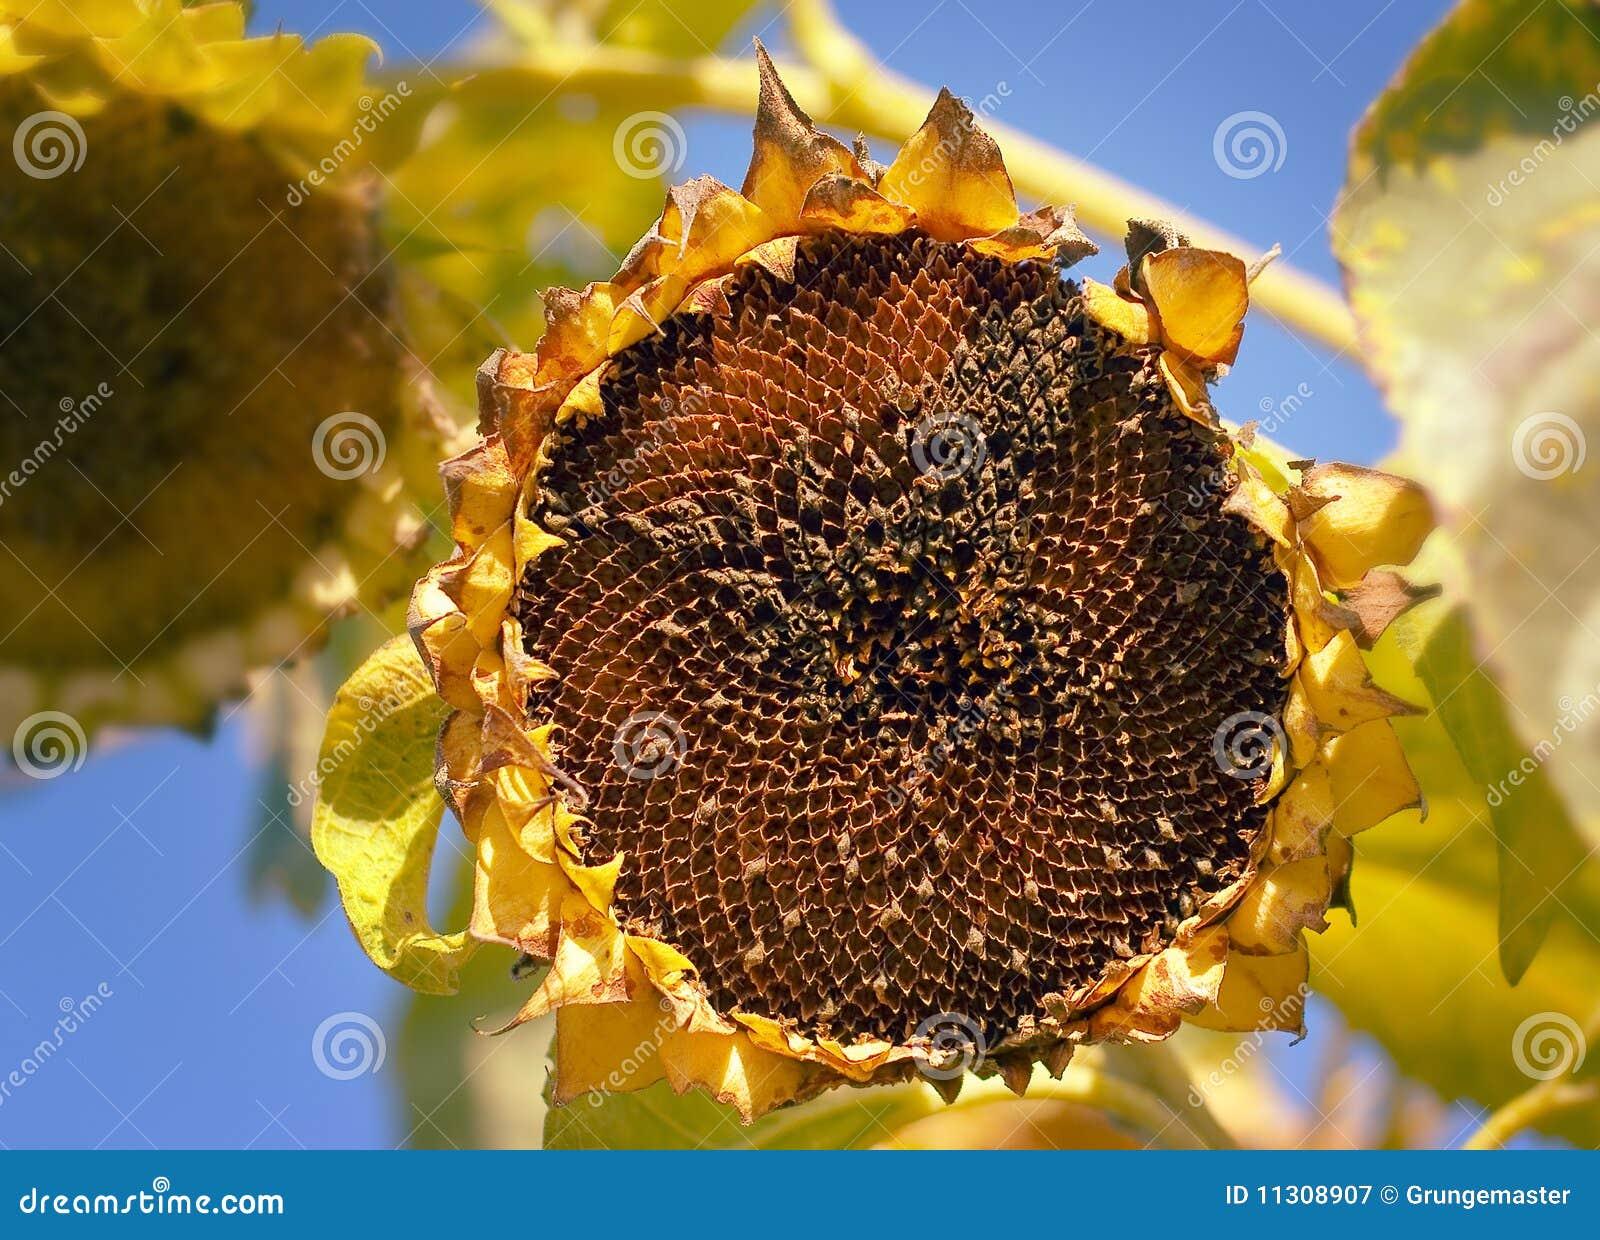 Verblassene Sonnenblume